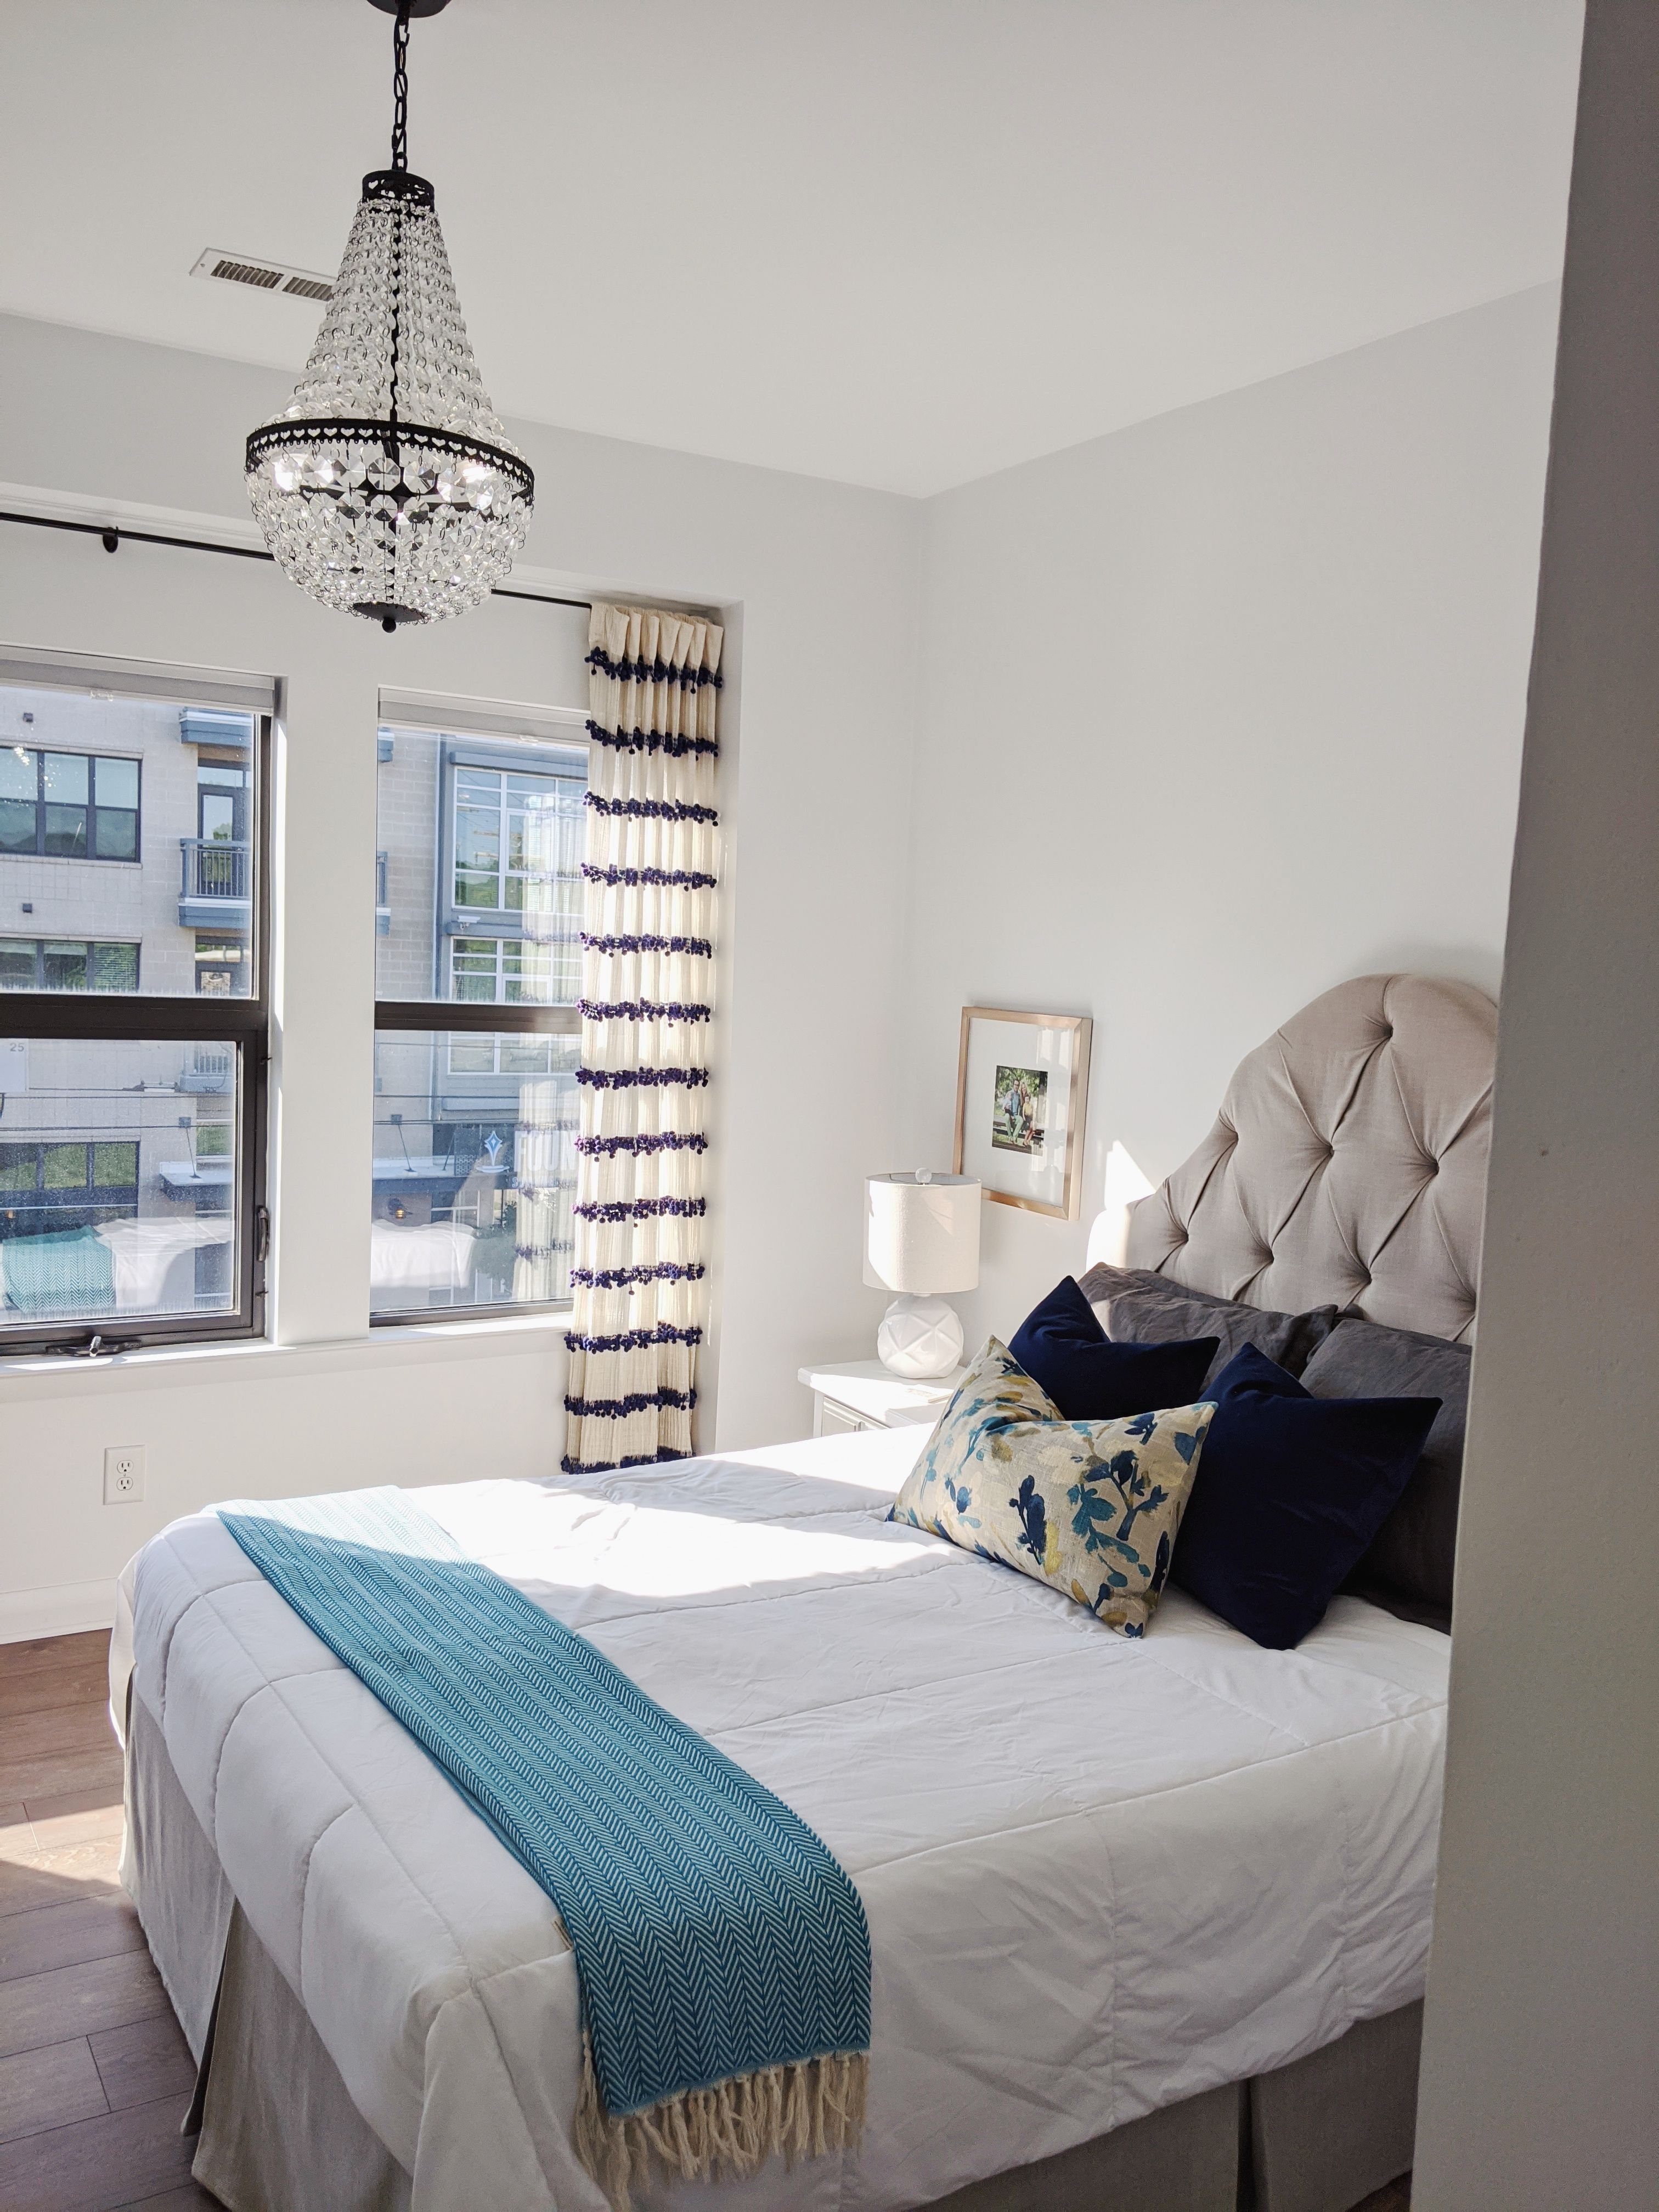 blue bedrooms in 2020 Blue bedroom, Blue interior, Home